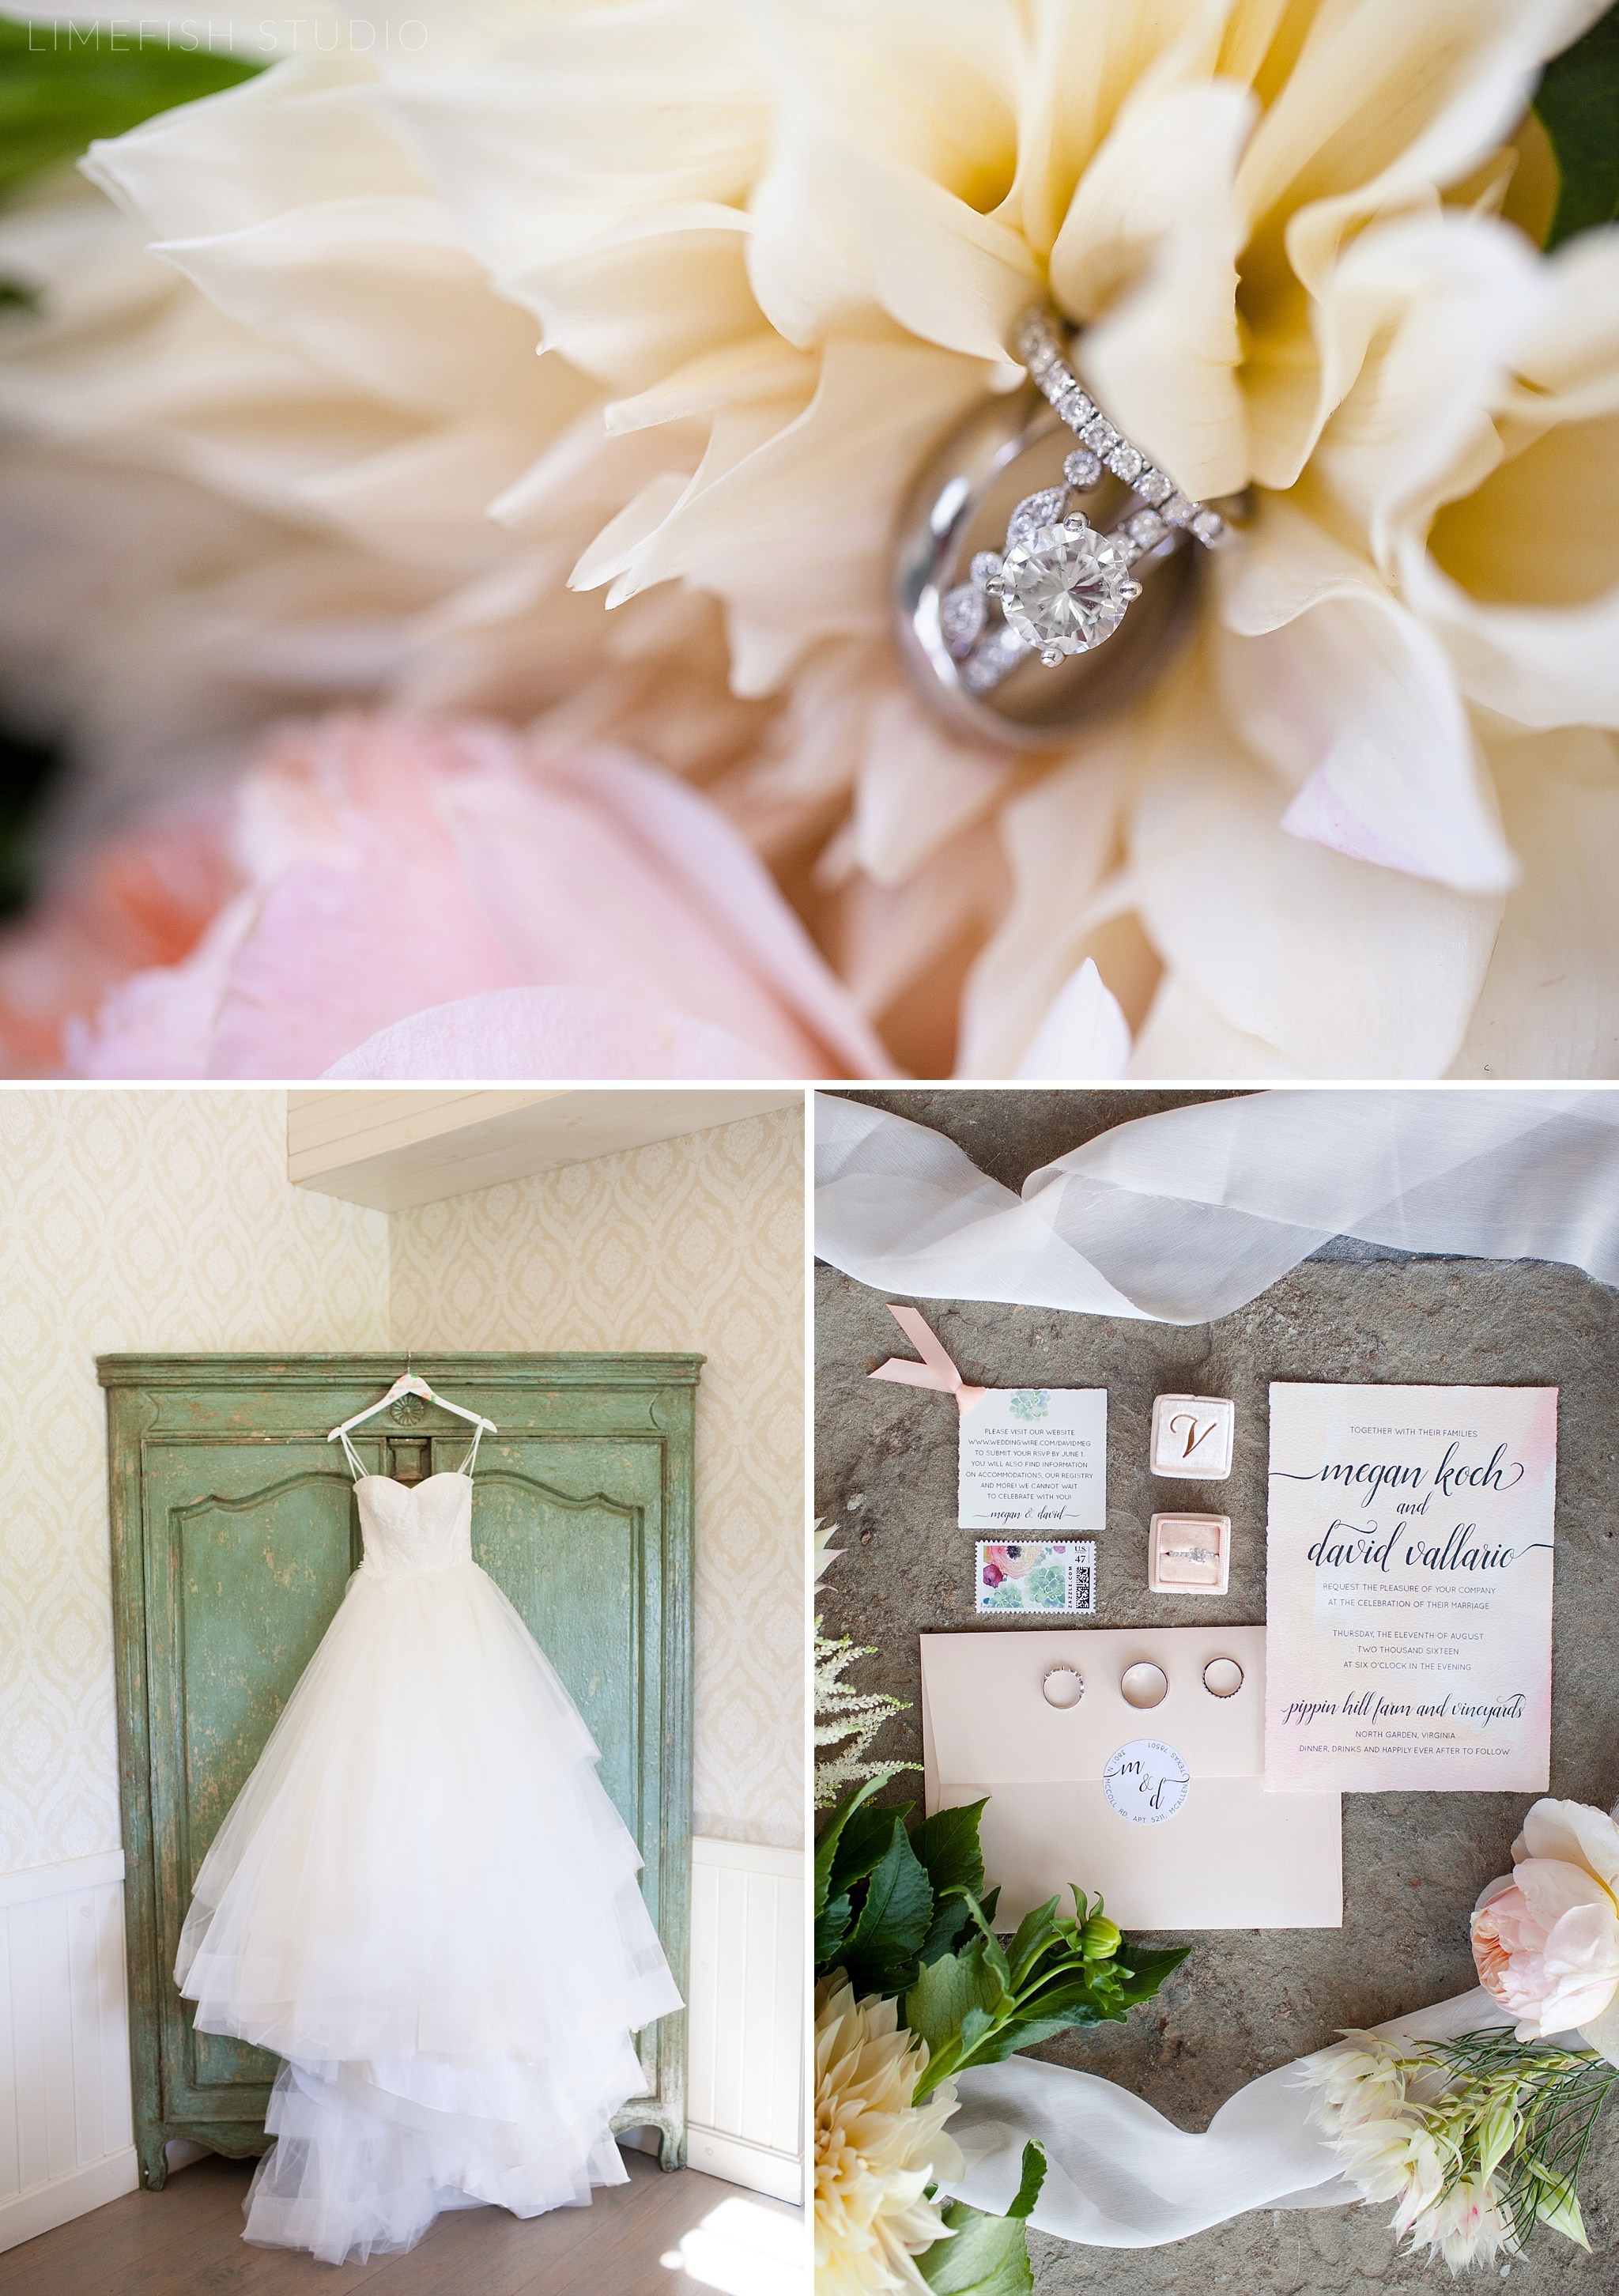 2016 Megan & David Pippin Hill Farm & Vineyards Wedding by Limefish Studio Photography   Charlottesville Virginia Wedding